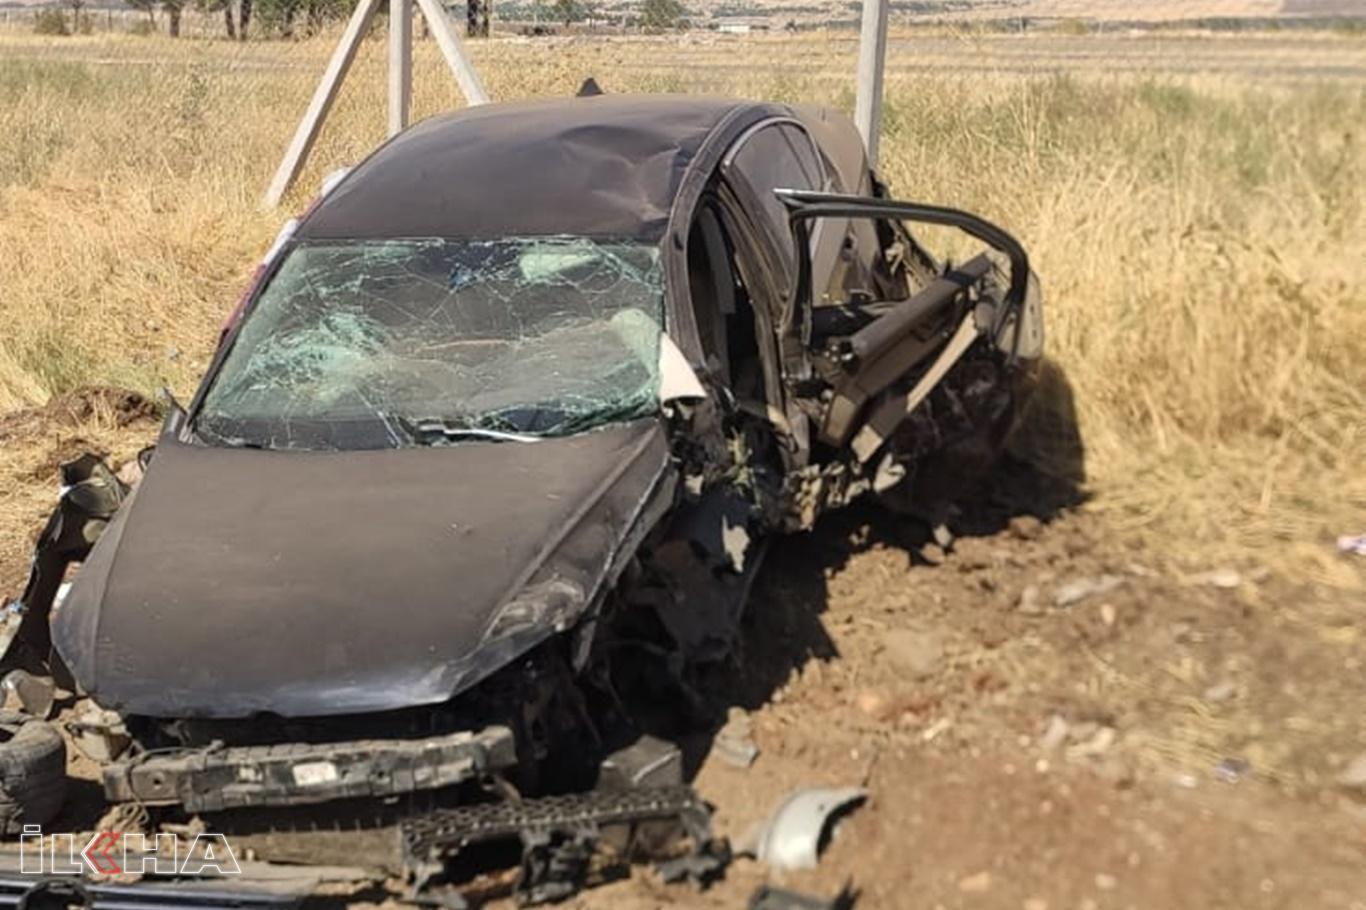 Diyarbakırda otomobil kaza yaptı: 2 yaralı